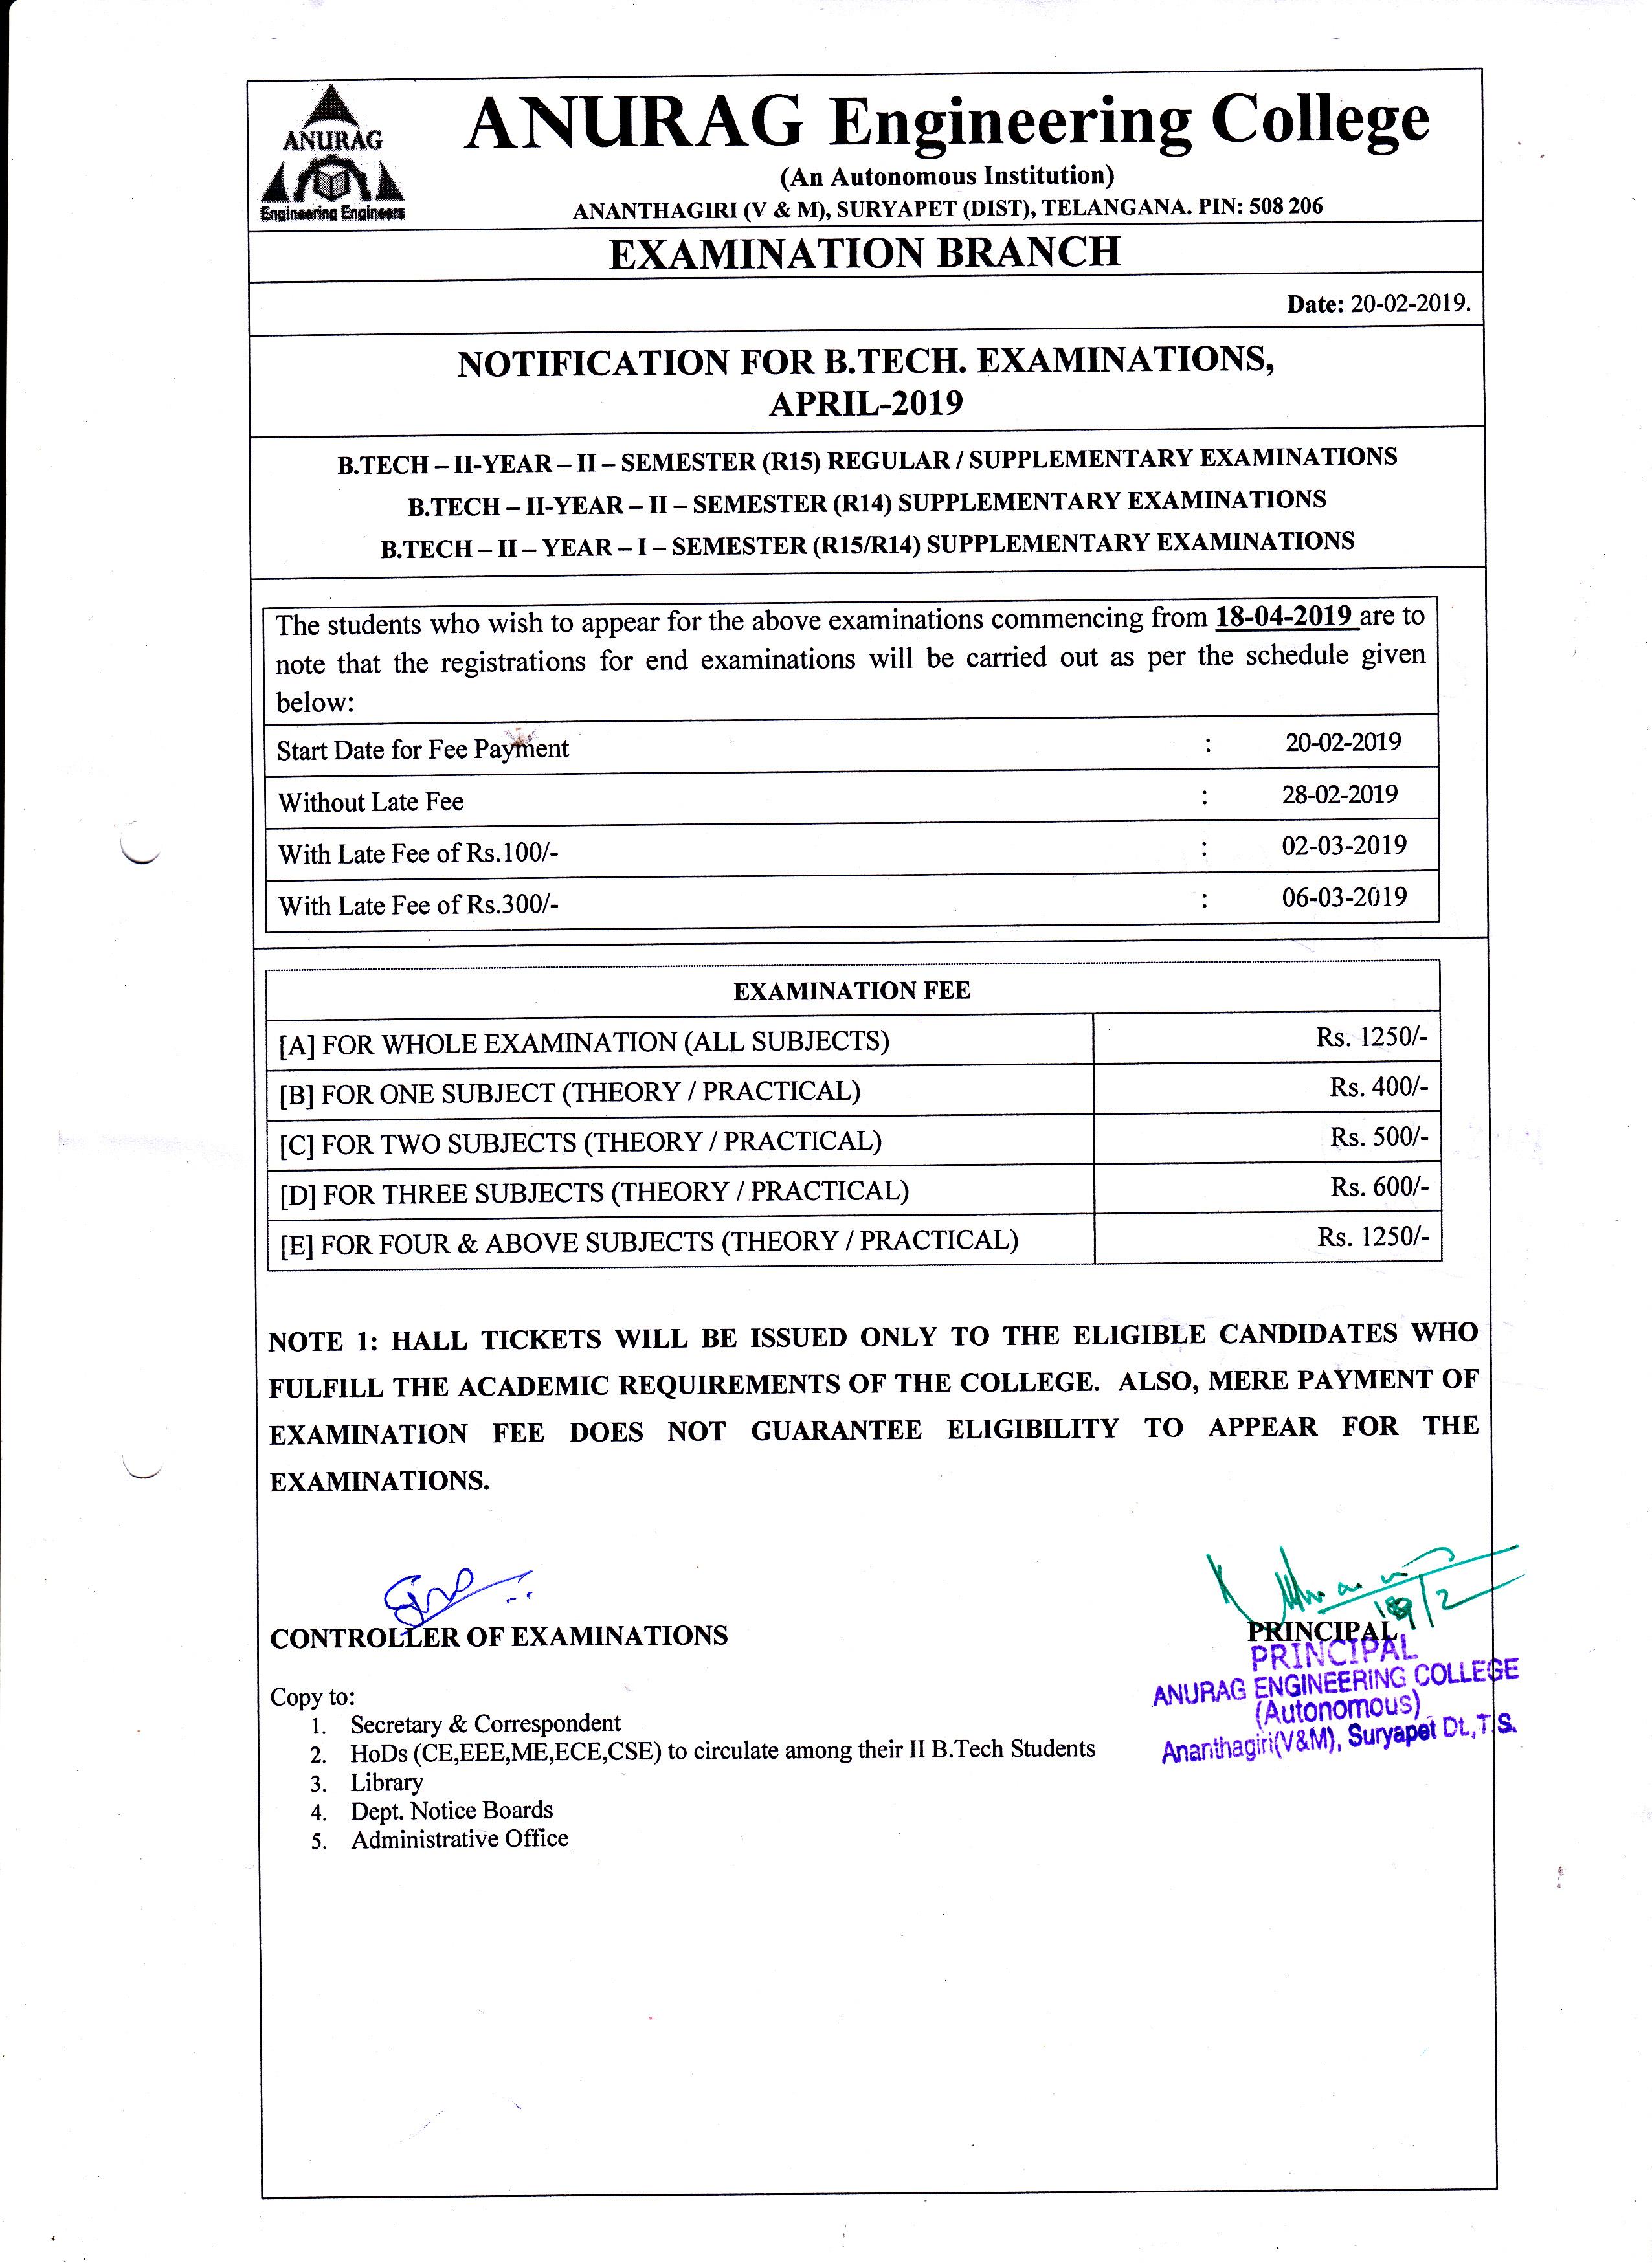 Notifications | Anurag Engineering College